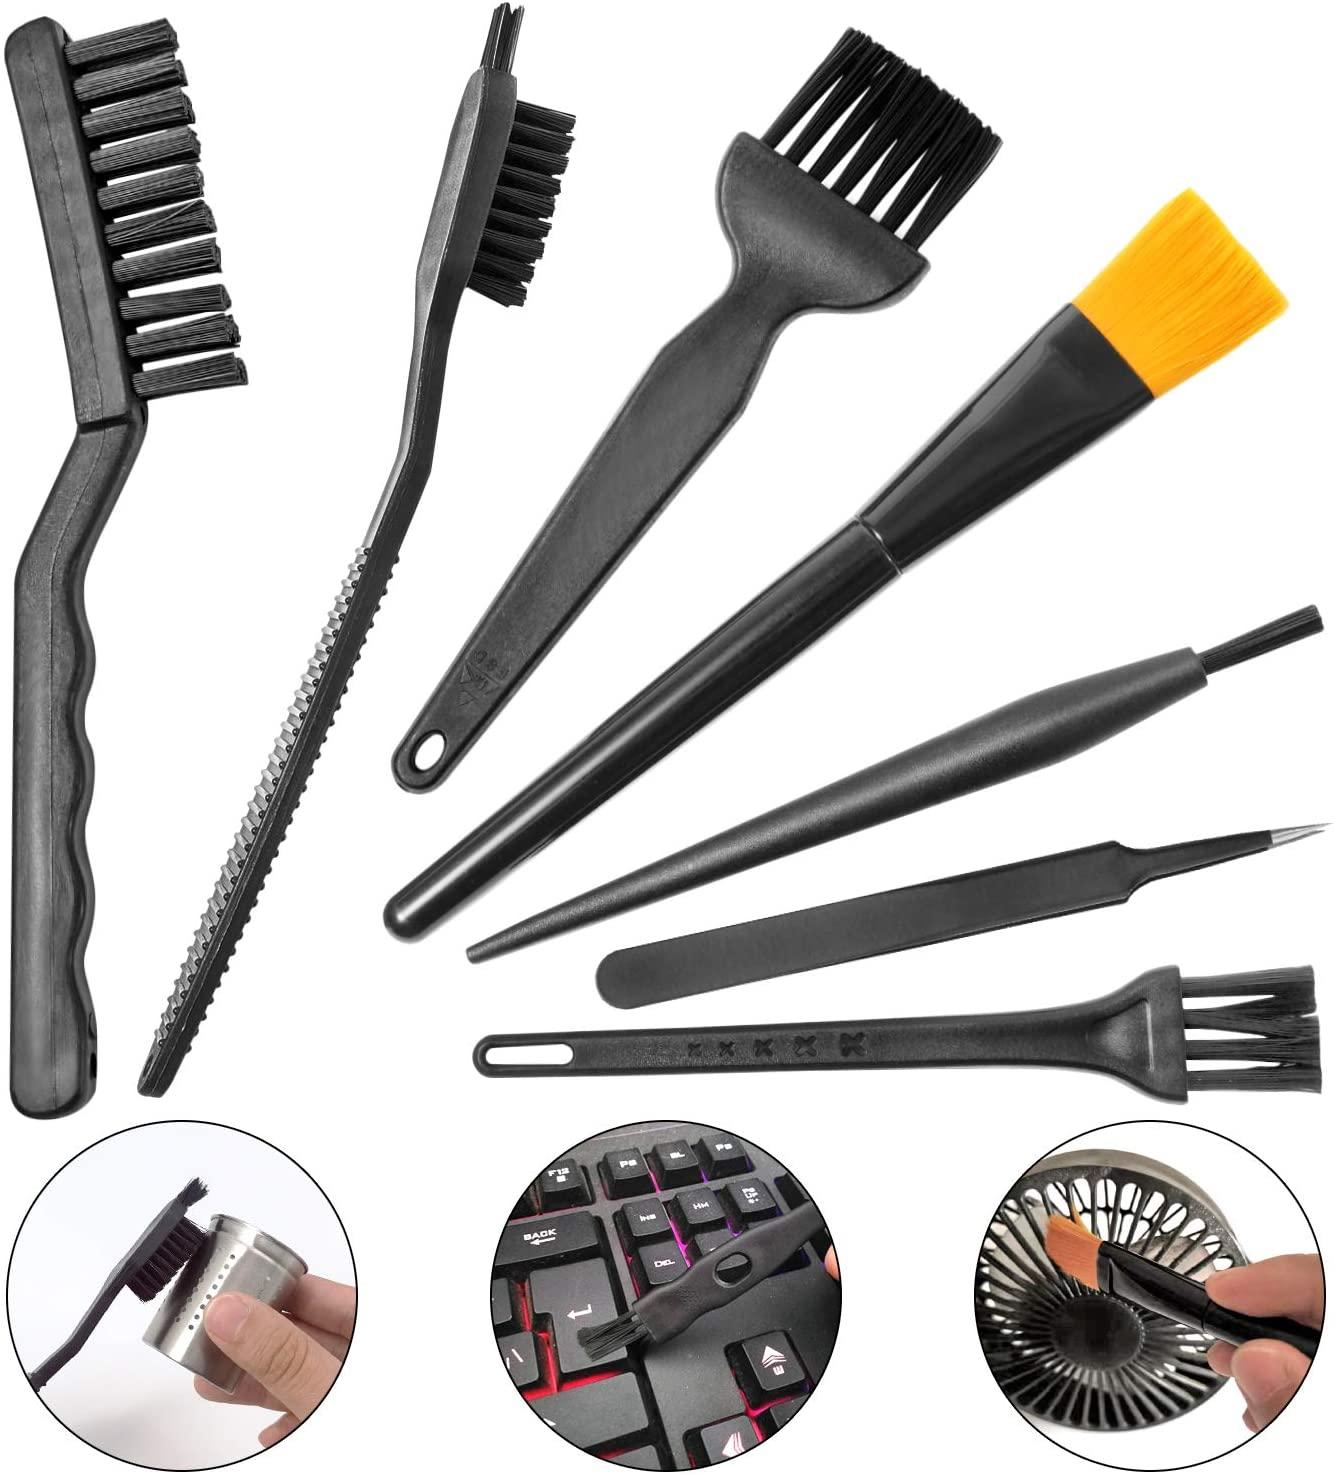 Computer PC Keyboard Laptop Electronics Camera Small Cleaning Brush Kit (Black, Set of 7)